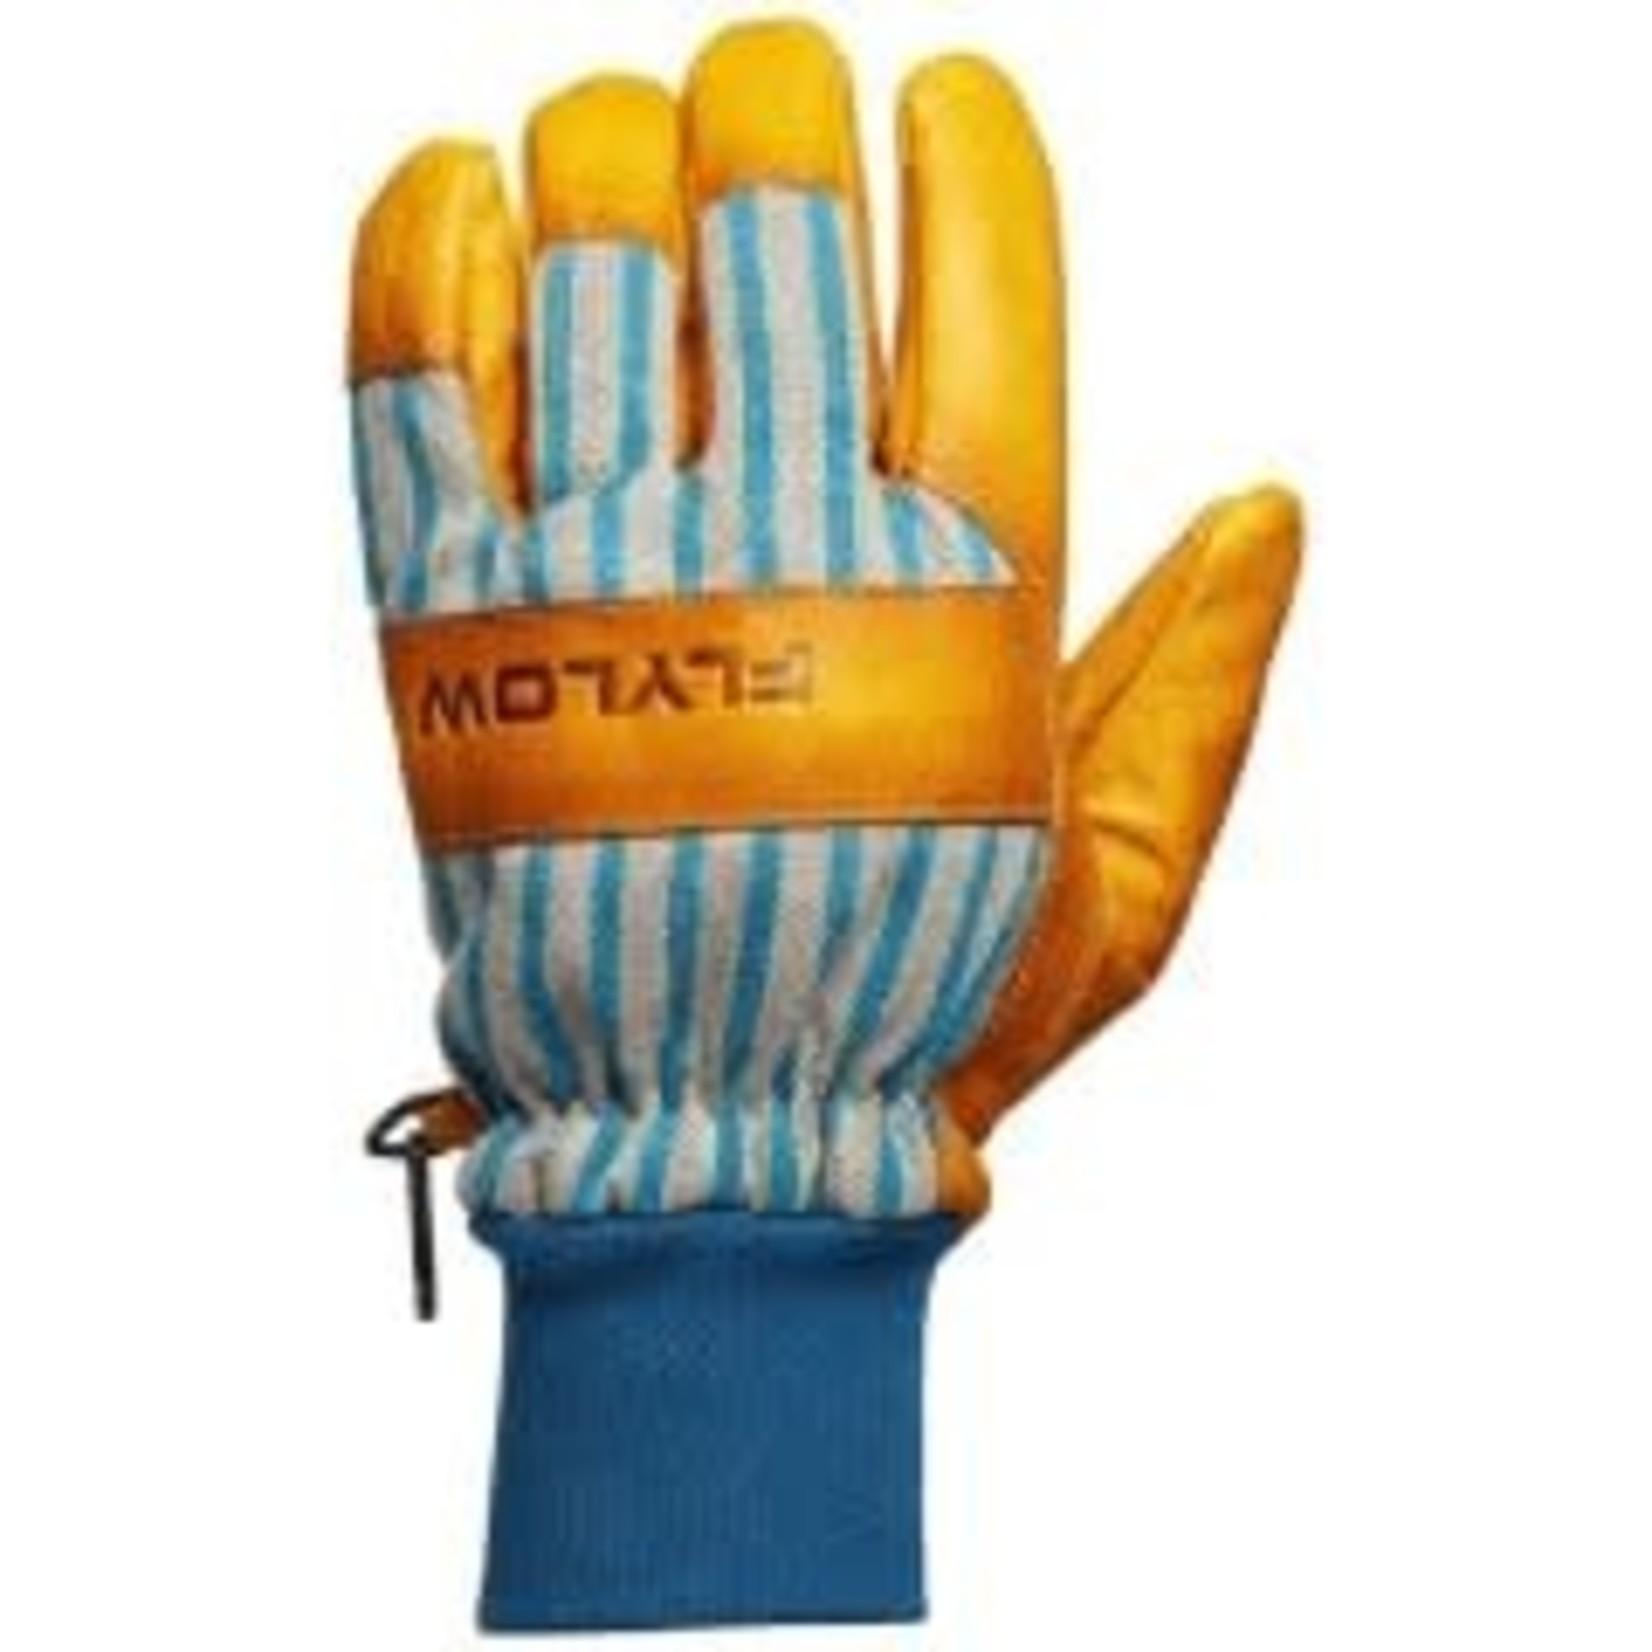 FlyLow FlyLow Glove Tough Guy Glove